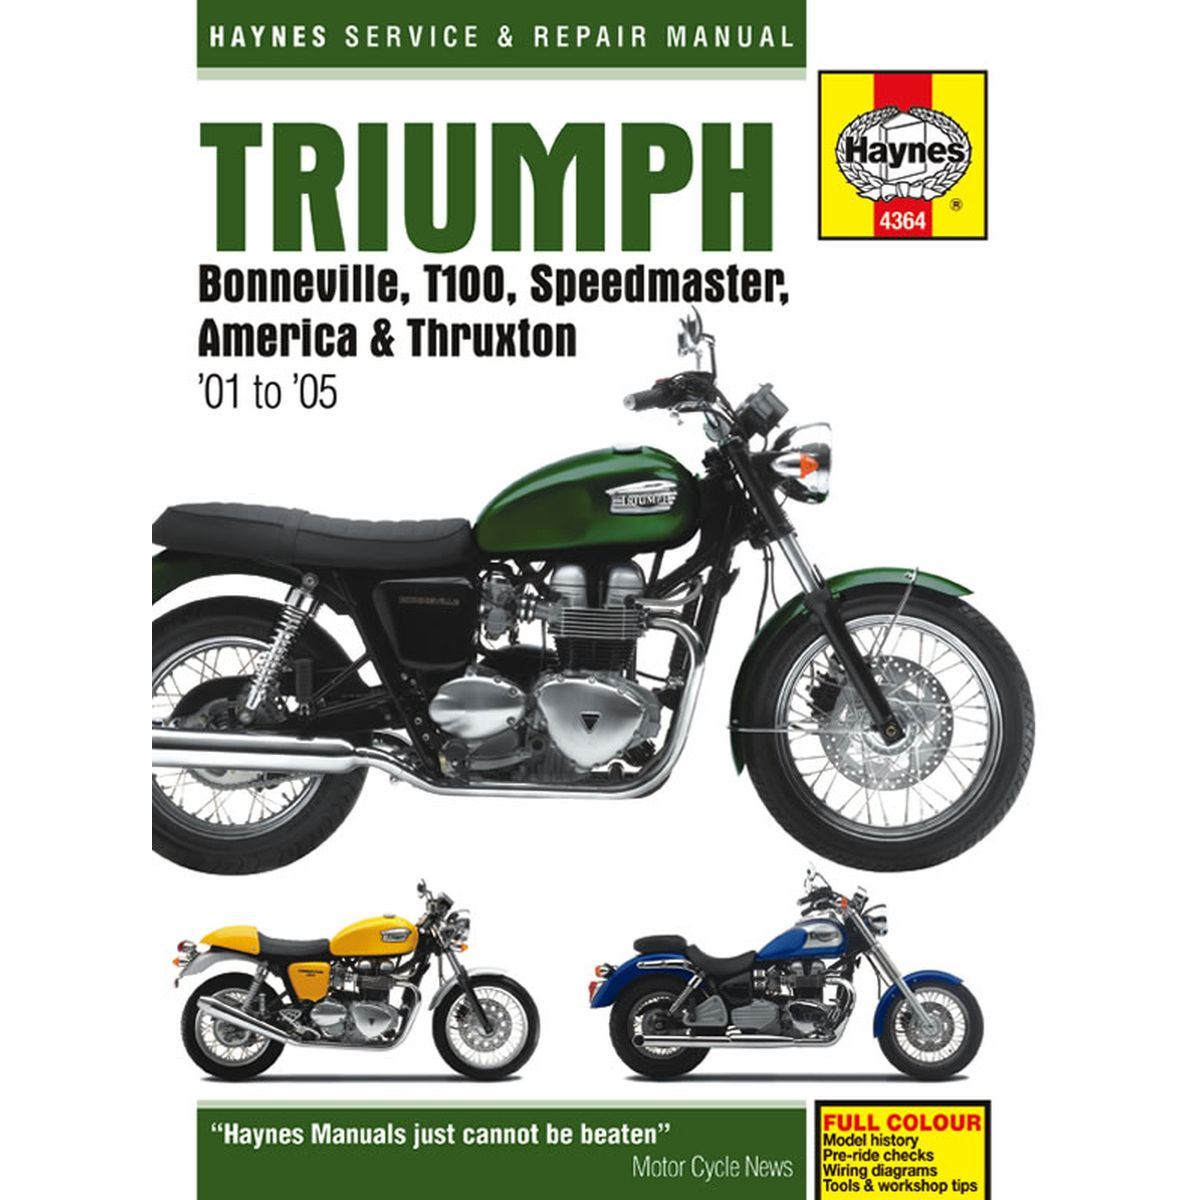 manual haynes for 2006 triumph bonneville 790cc ebay rh ebay co uk triumph t100 manual online triumph t100 manual pdf